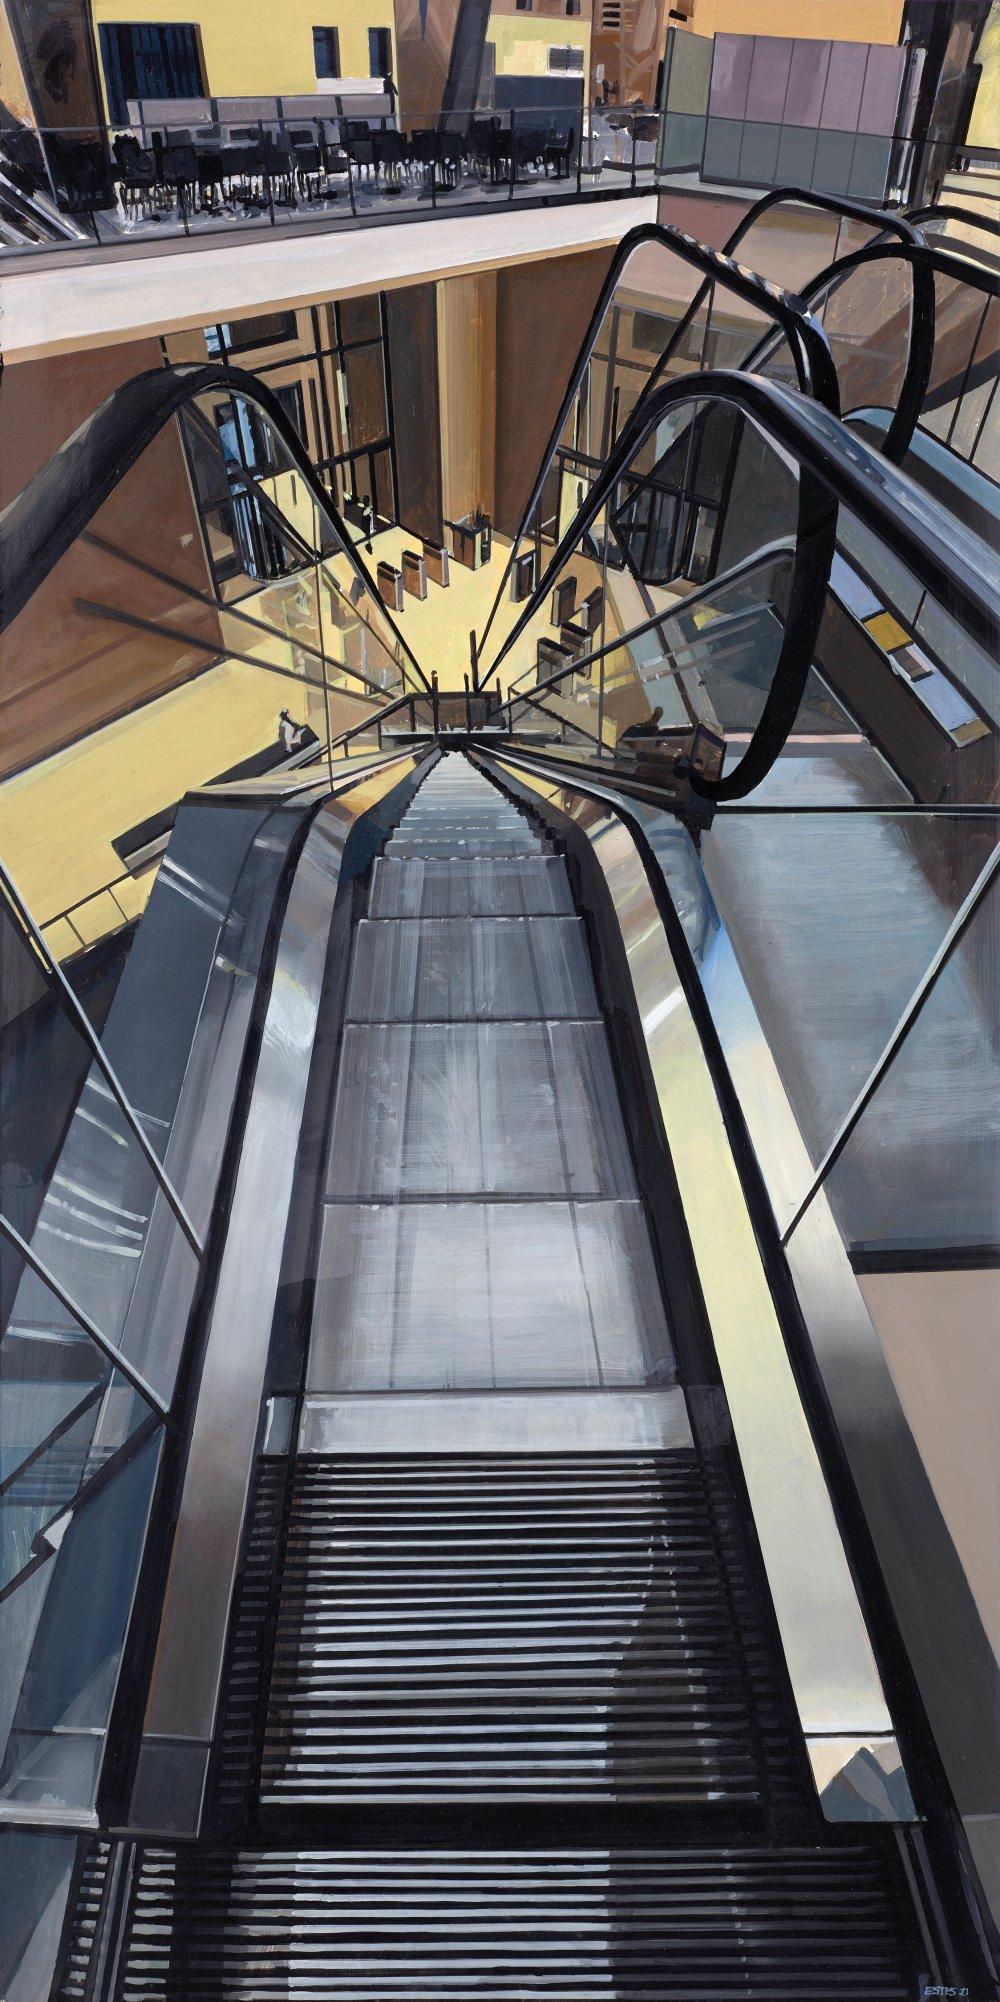 Escalator in Hearst Tower